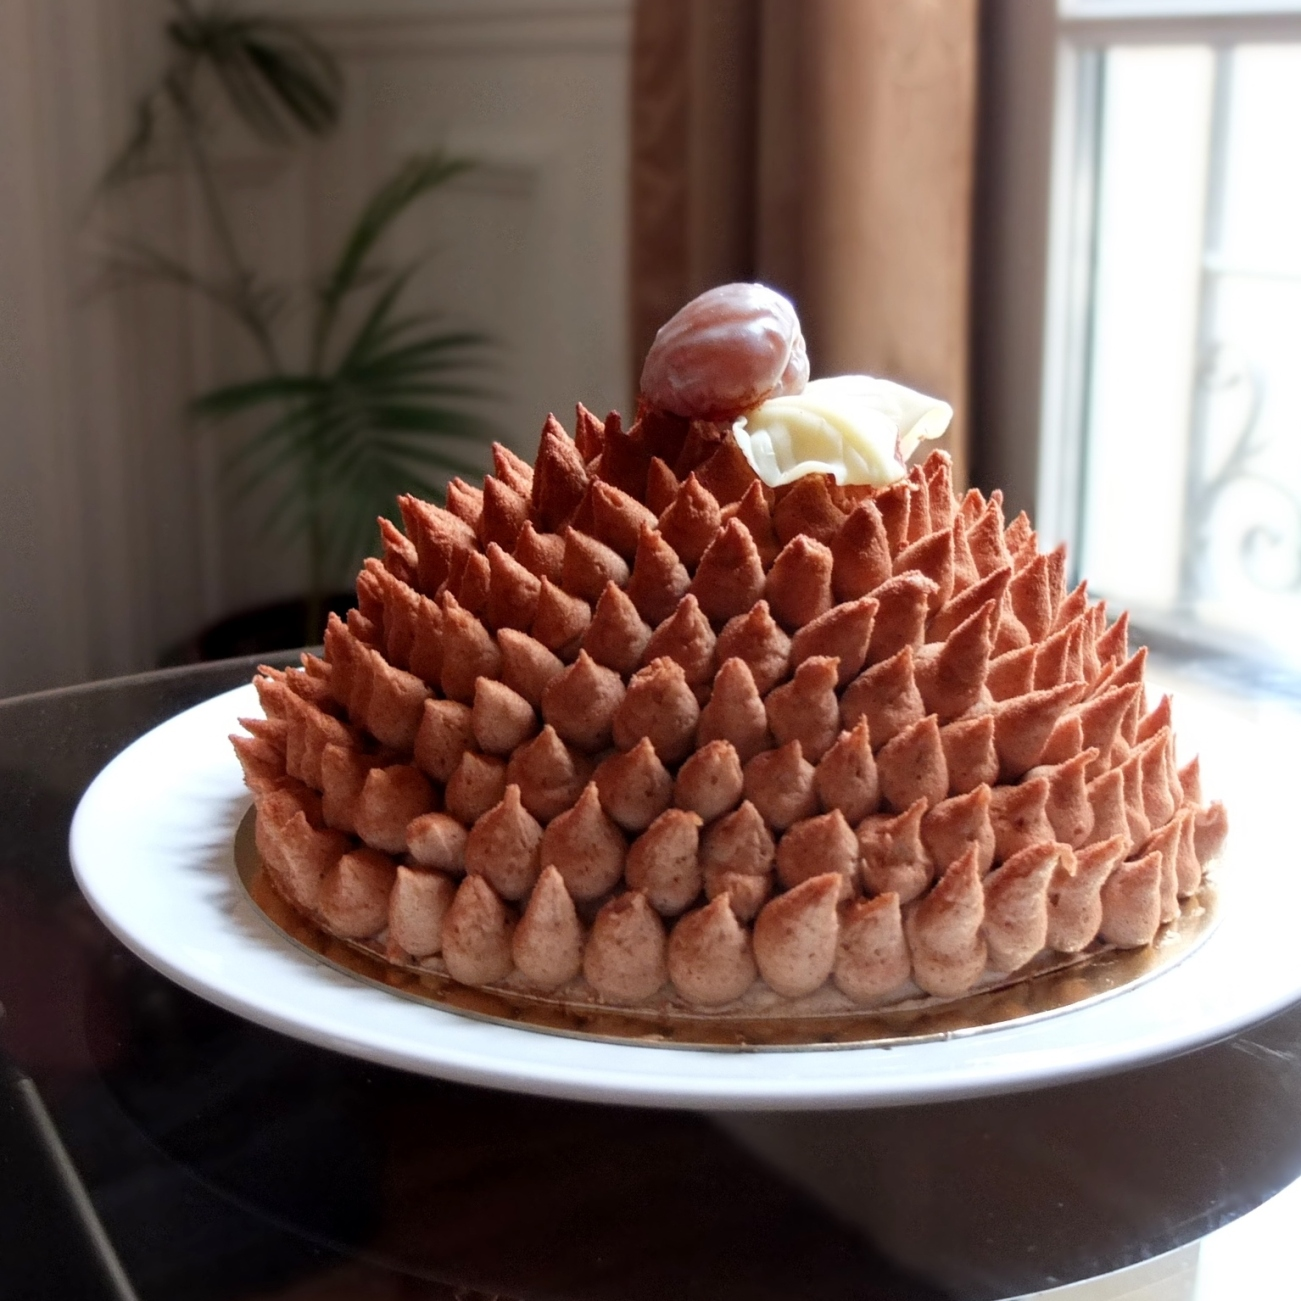 Chestnut hedgehog cake